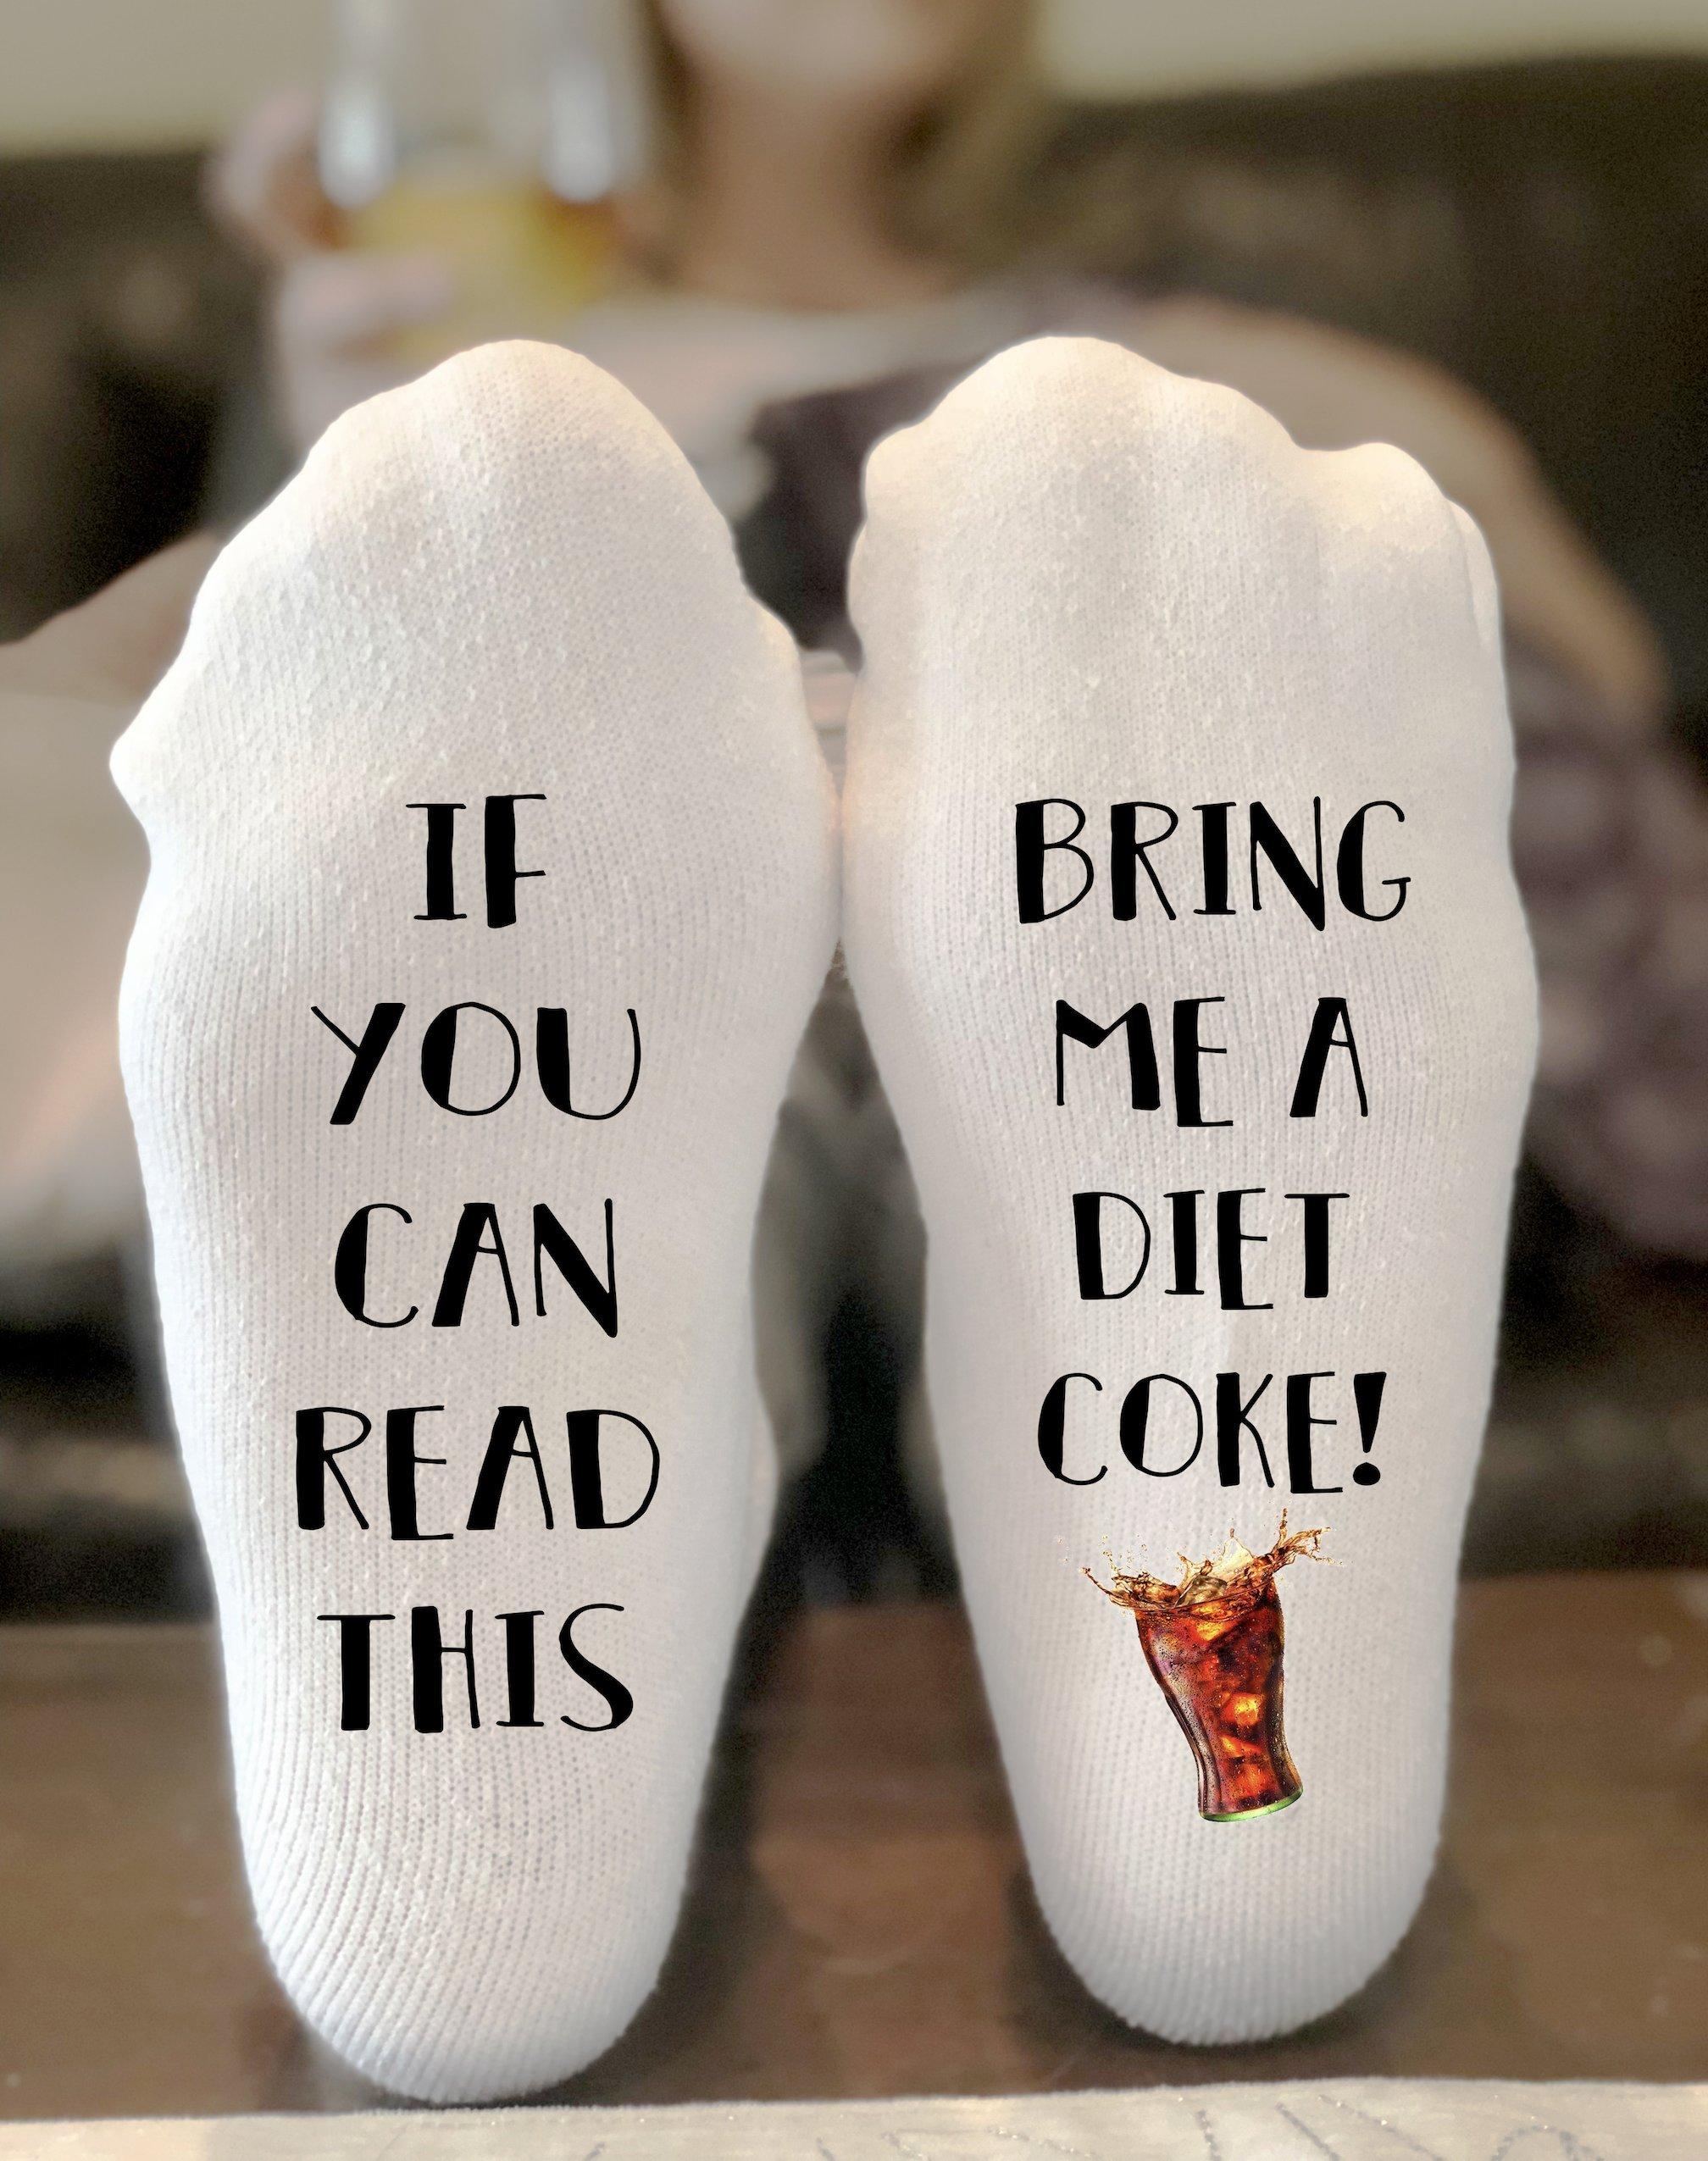 If You Can Read This Bring Me A Diet Coke Socks Novelty Funky Crew Socks Men Women Christmas Gifts Cotton Slipper Socks